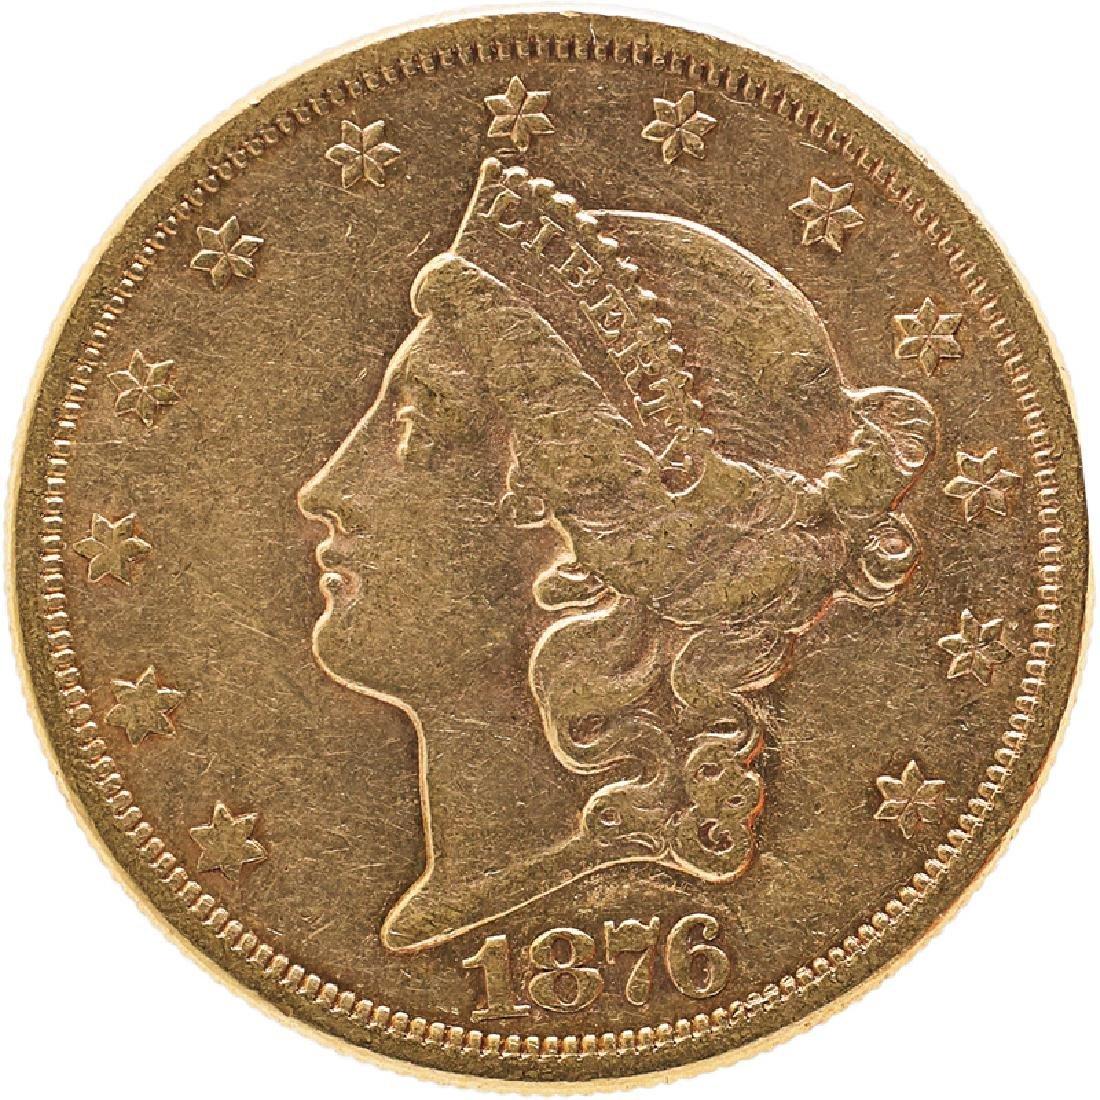 U.S. 1876-S LIBERTY $20 GOLD COIN